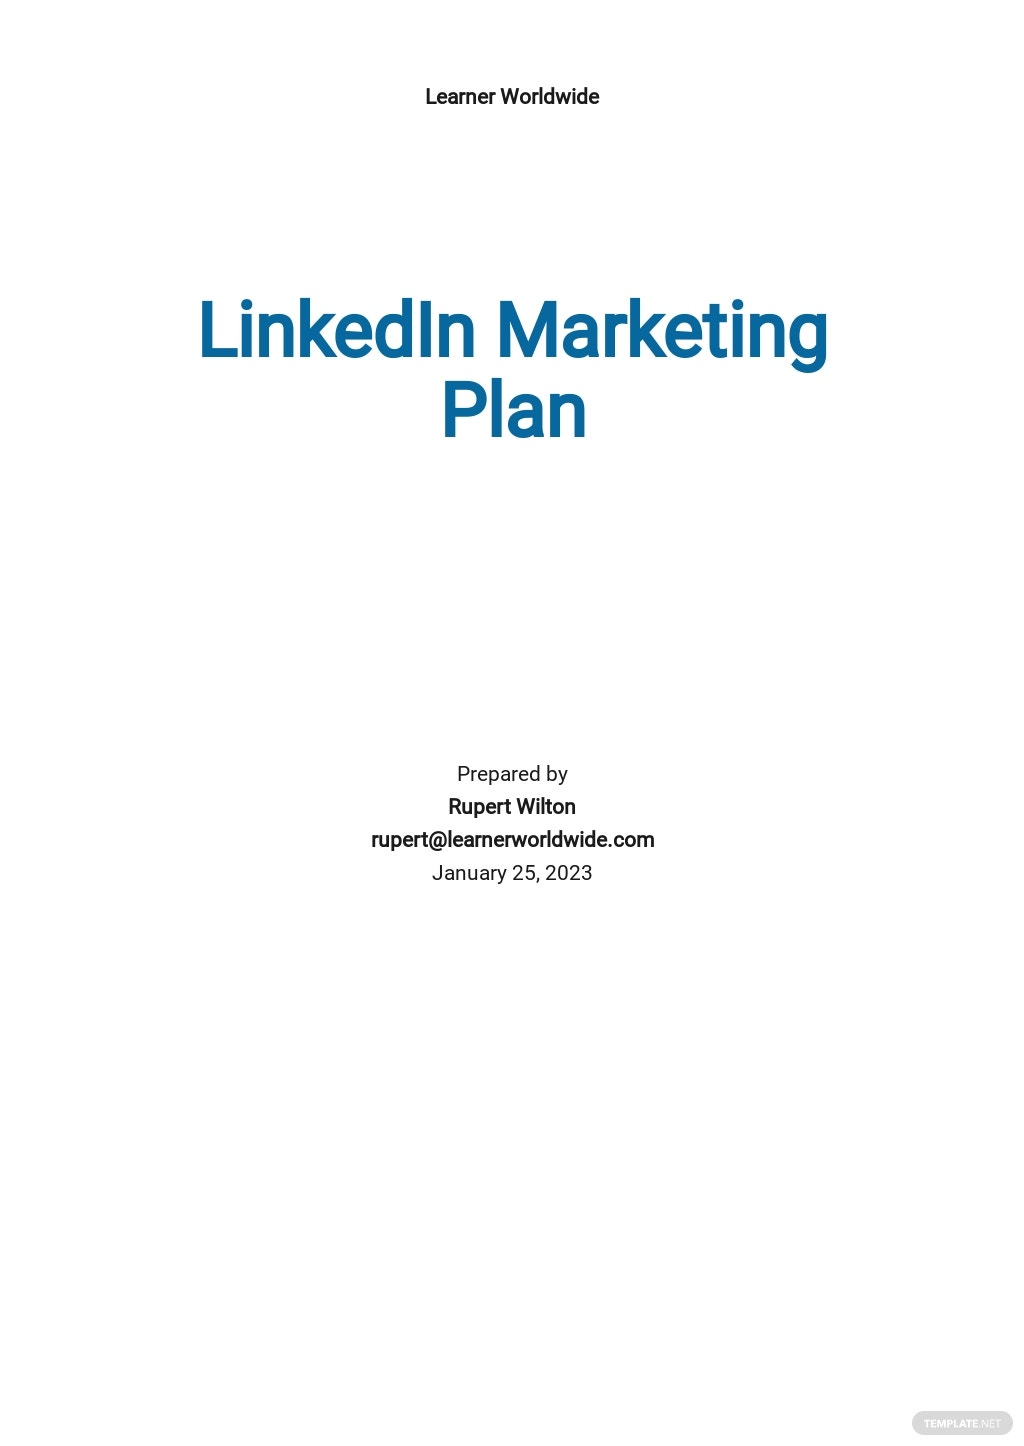 LinkedIn Marketing Plan Template.jpe